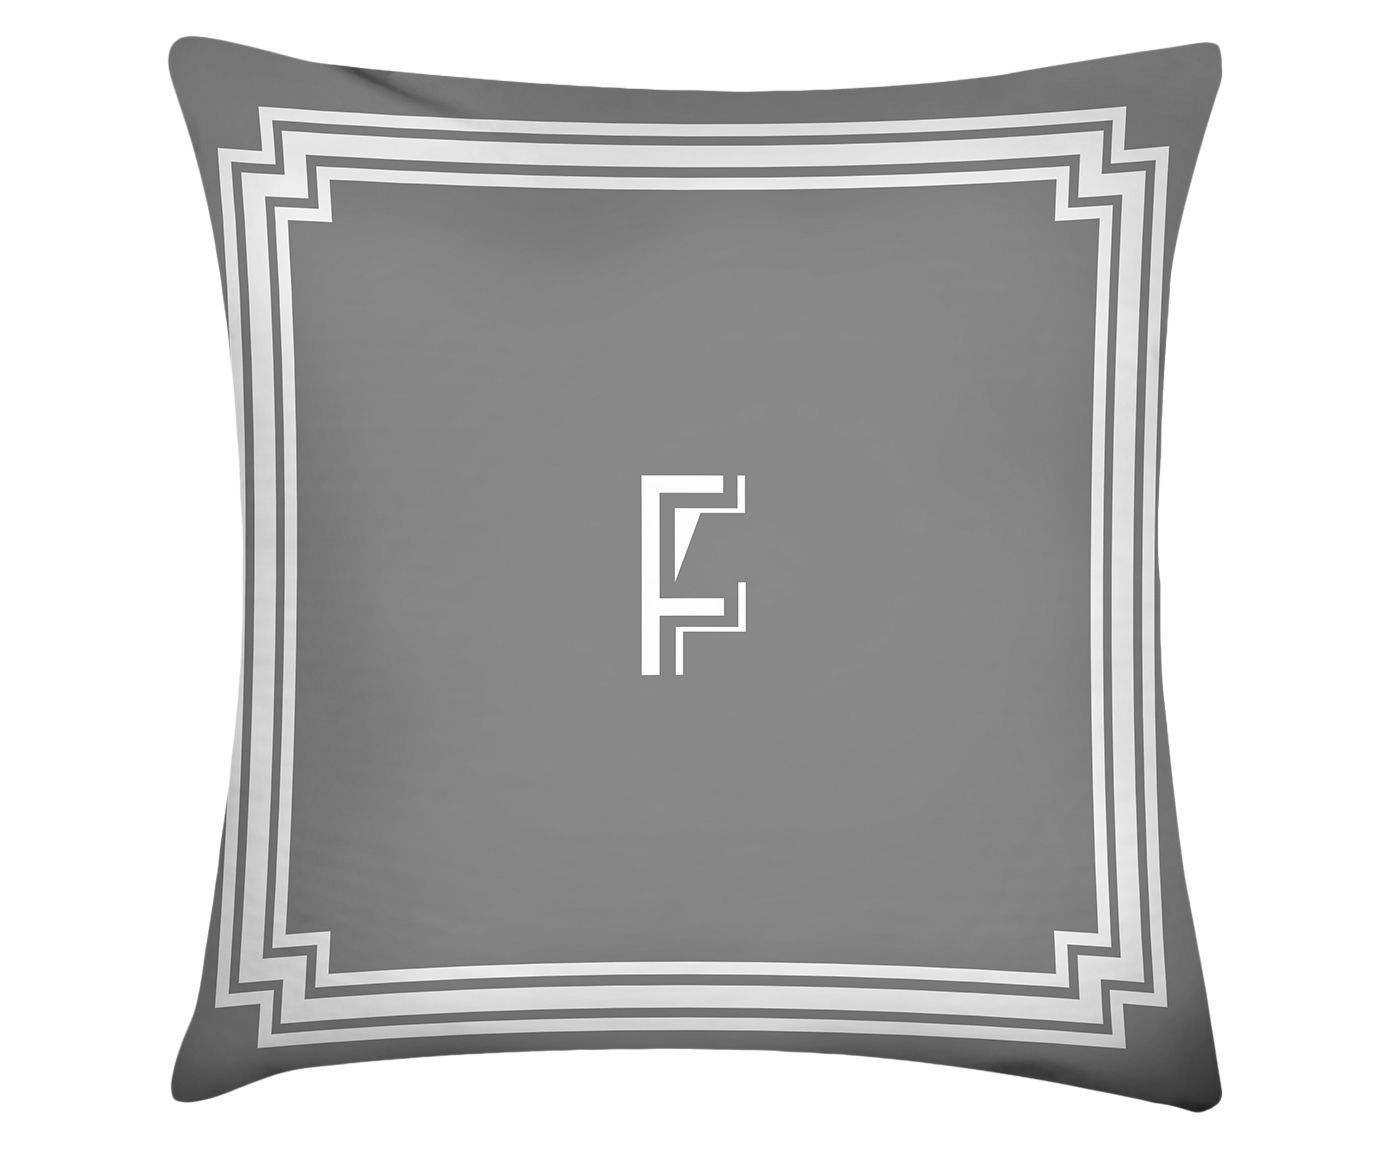 Almofada Letter F - 45x45cm | Westwing.com.br